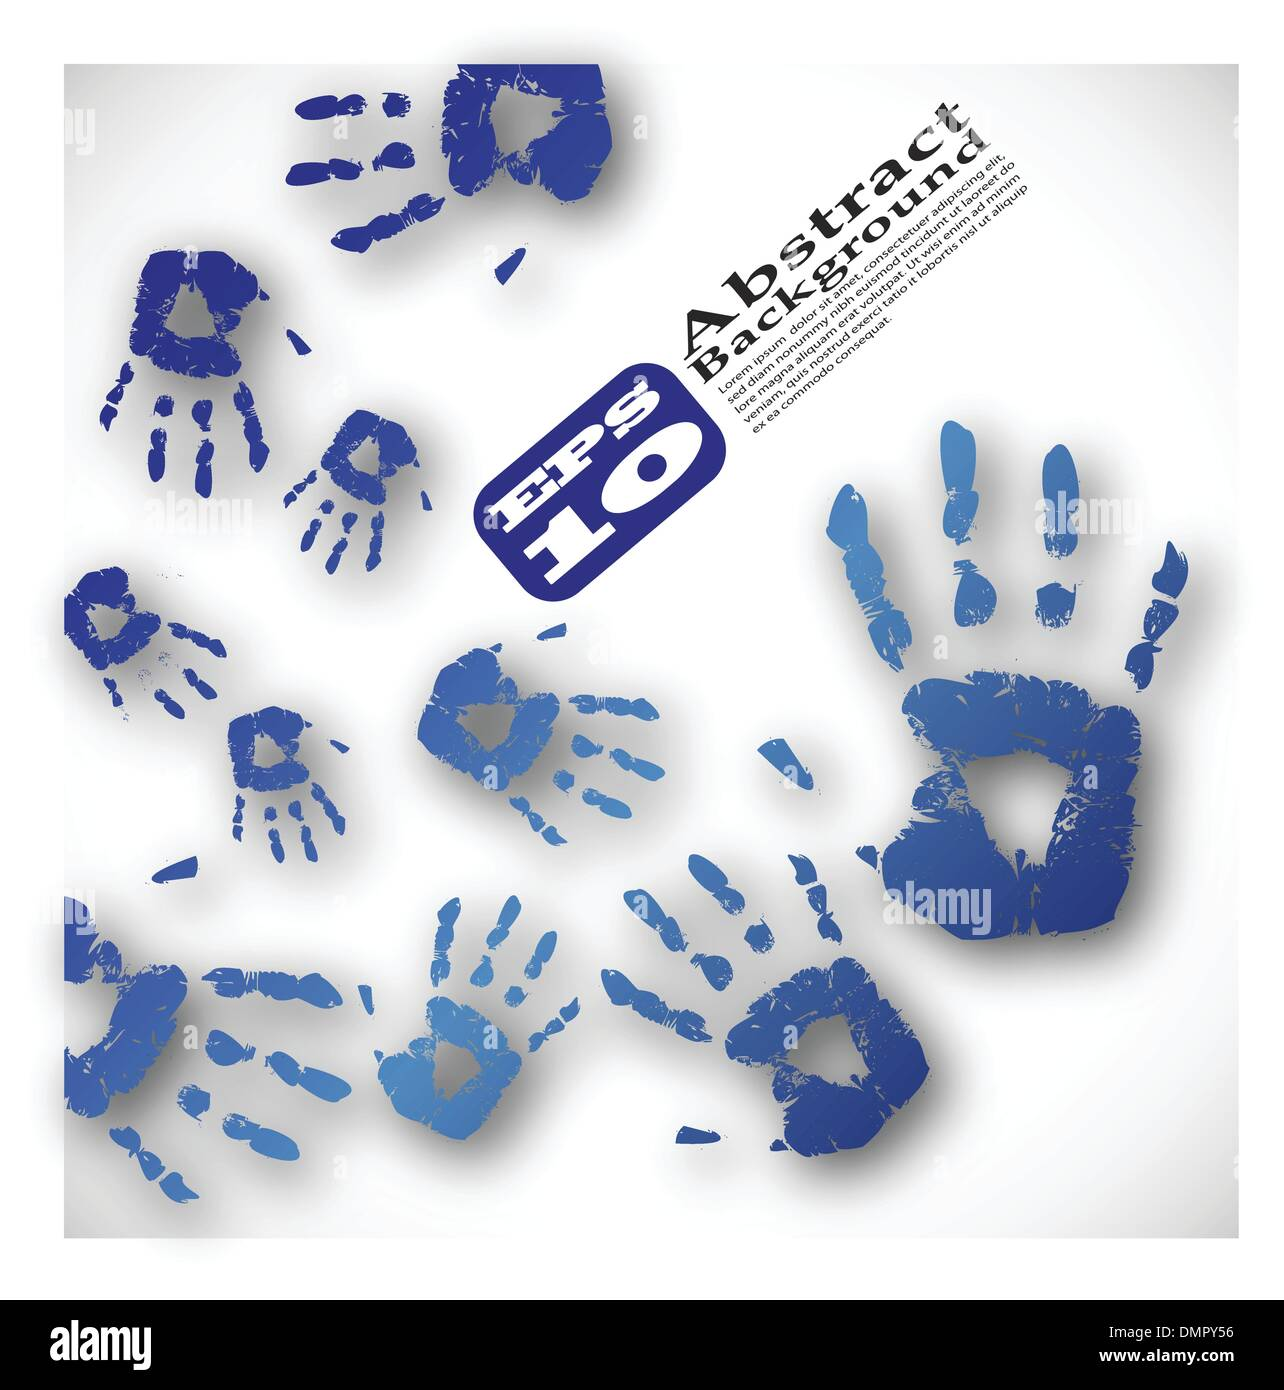 der Vektor Hand Druckfarbe abstrakten Hintergrund Stockbild